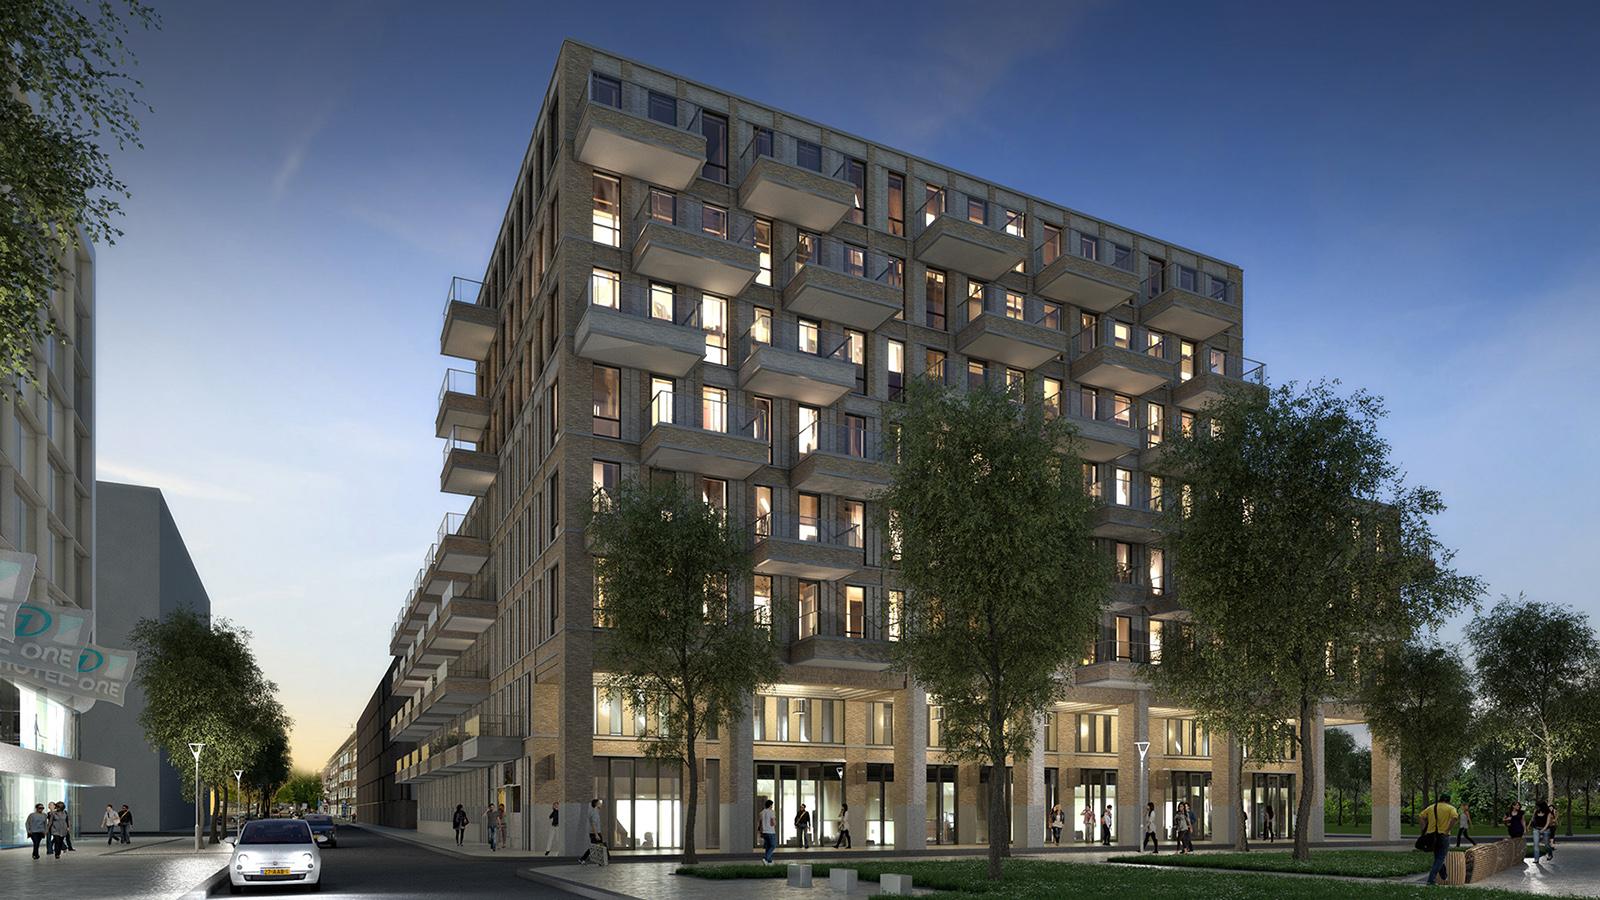 LEVS Square Amsterdam woongebouw